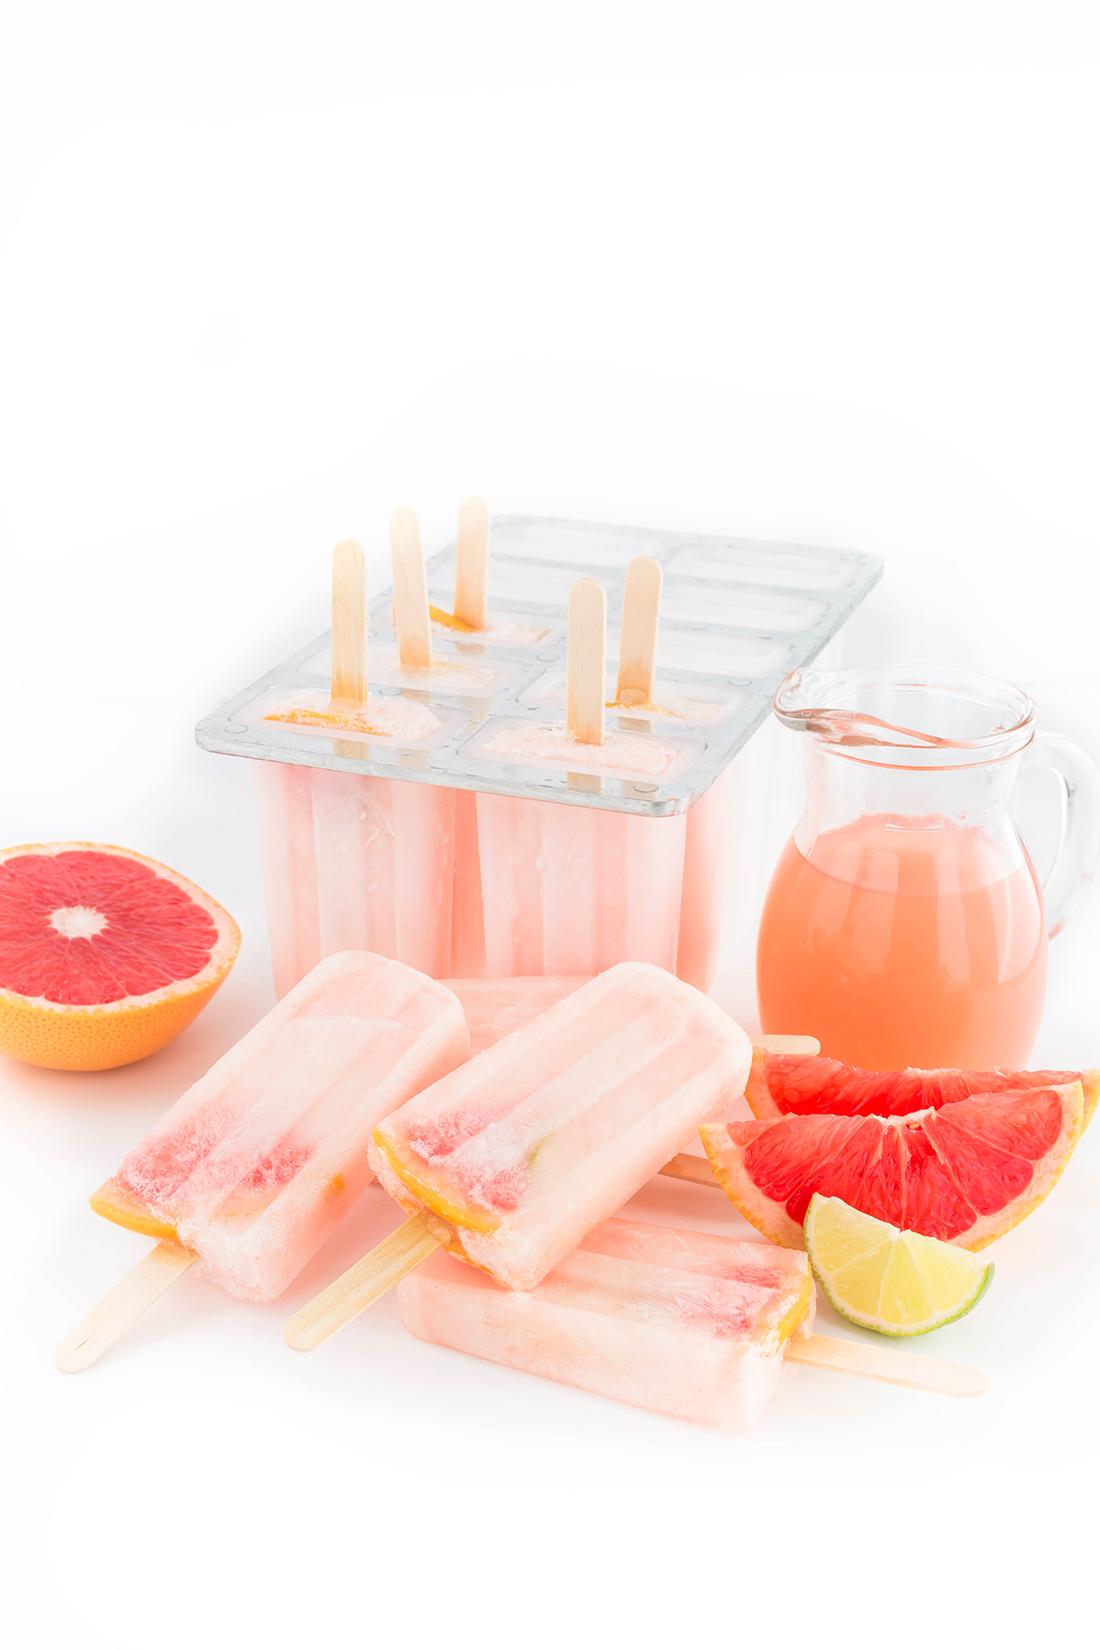 #vegan 3 ingredients SUGAR-FREE PINK GRAPEFRUIT POPSICLES - GHIACCIOLI al POMPELMO ROSA 3 ingredienti idratanti limonata al pompelmo recipe